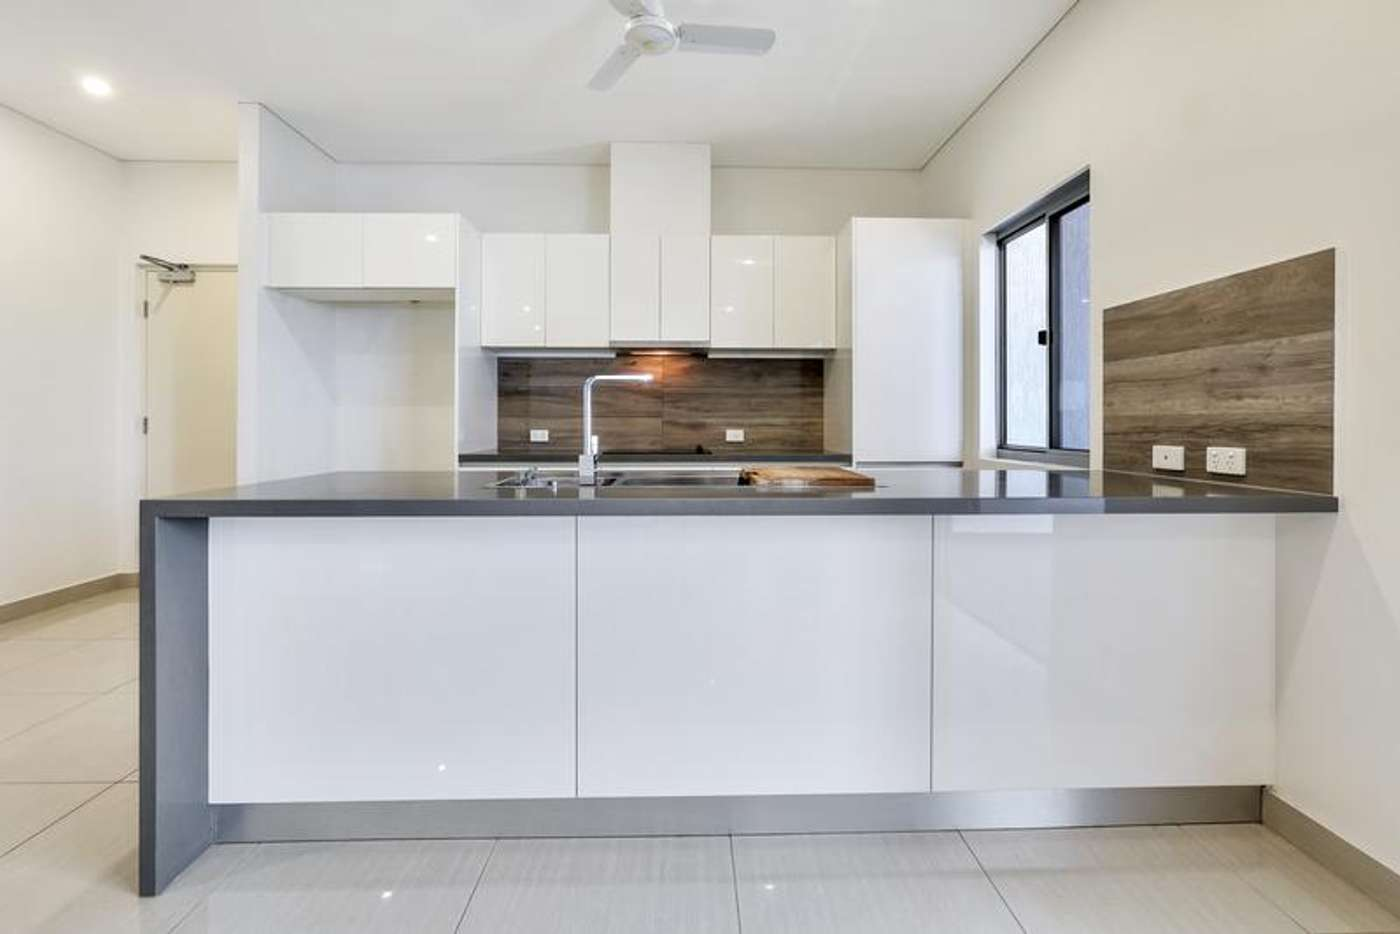 Main view of Homely unit listing, 6/3 Coronation Drive, Stuart Park NT 820